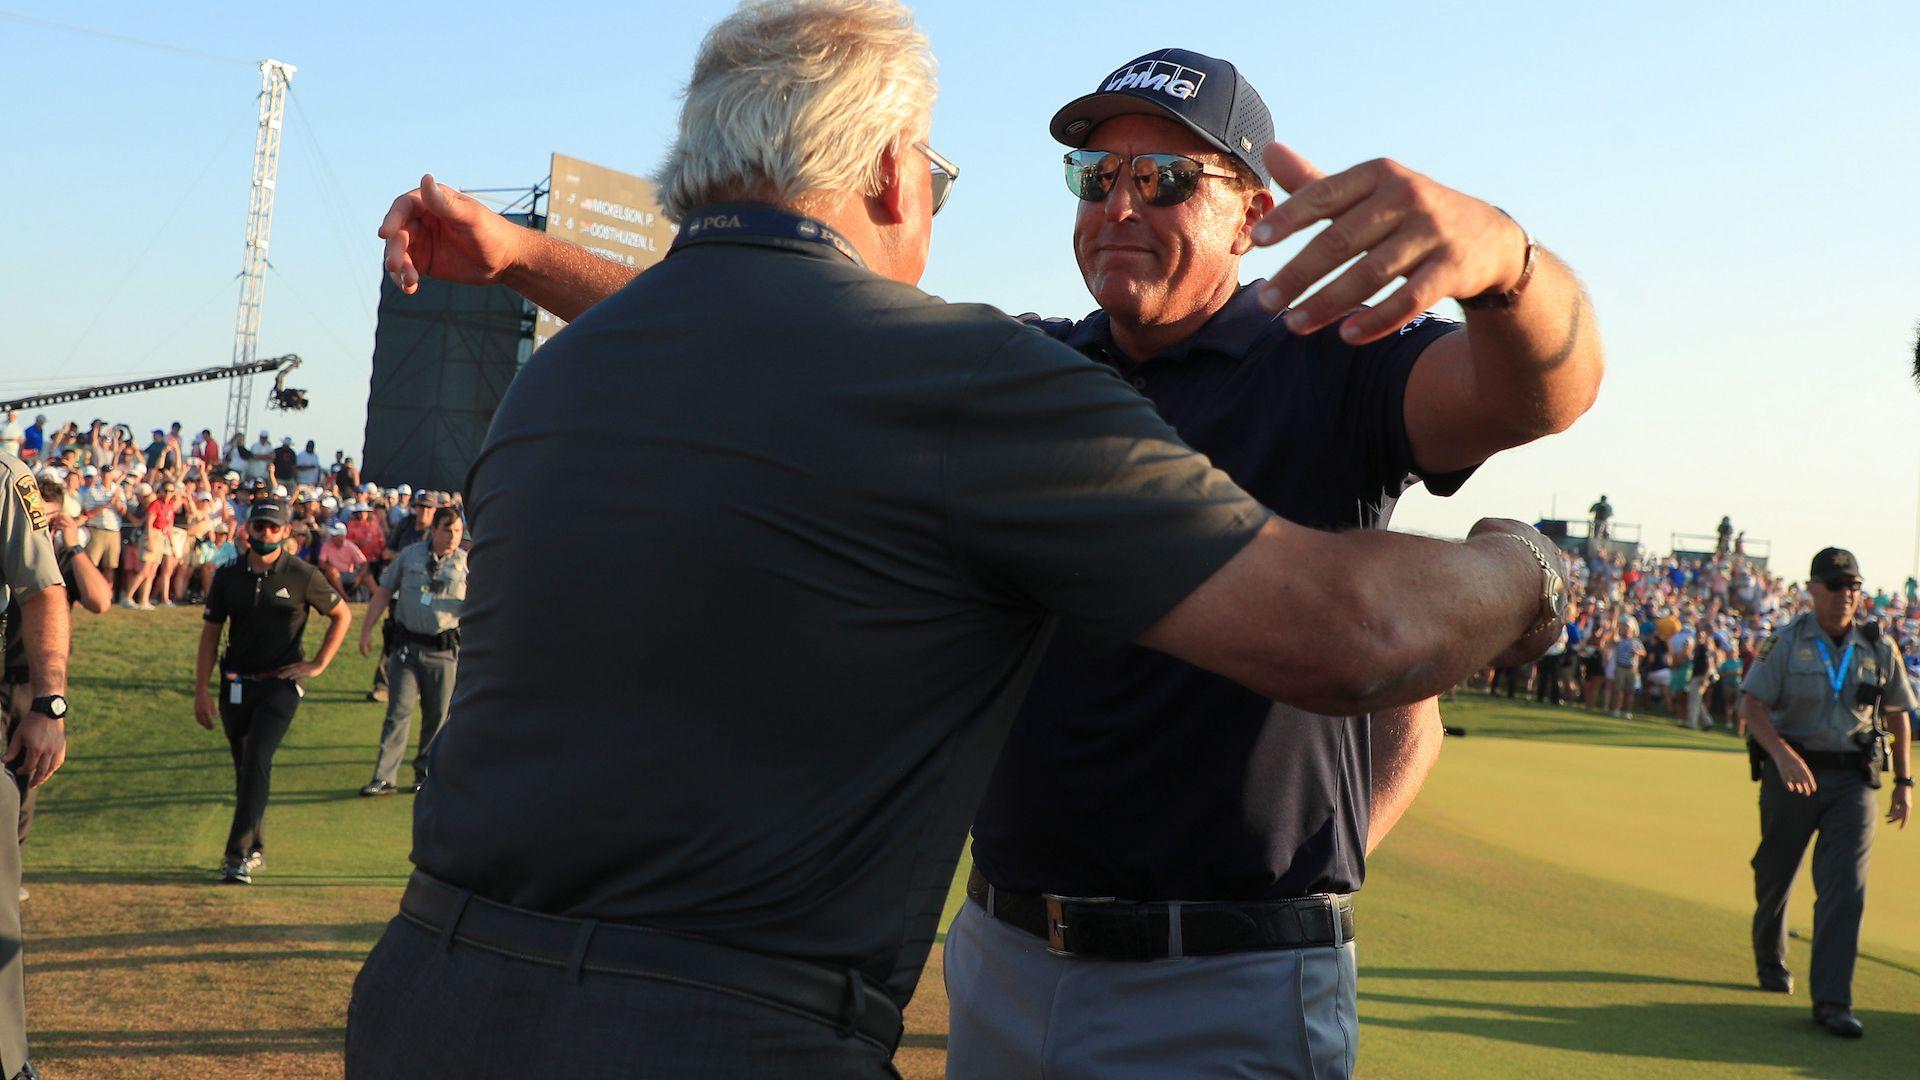 Ветеран пренаписа историята на голфа и счупи рекорд на половин век